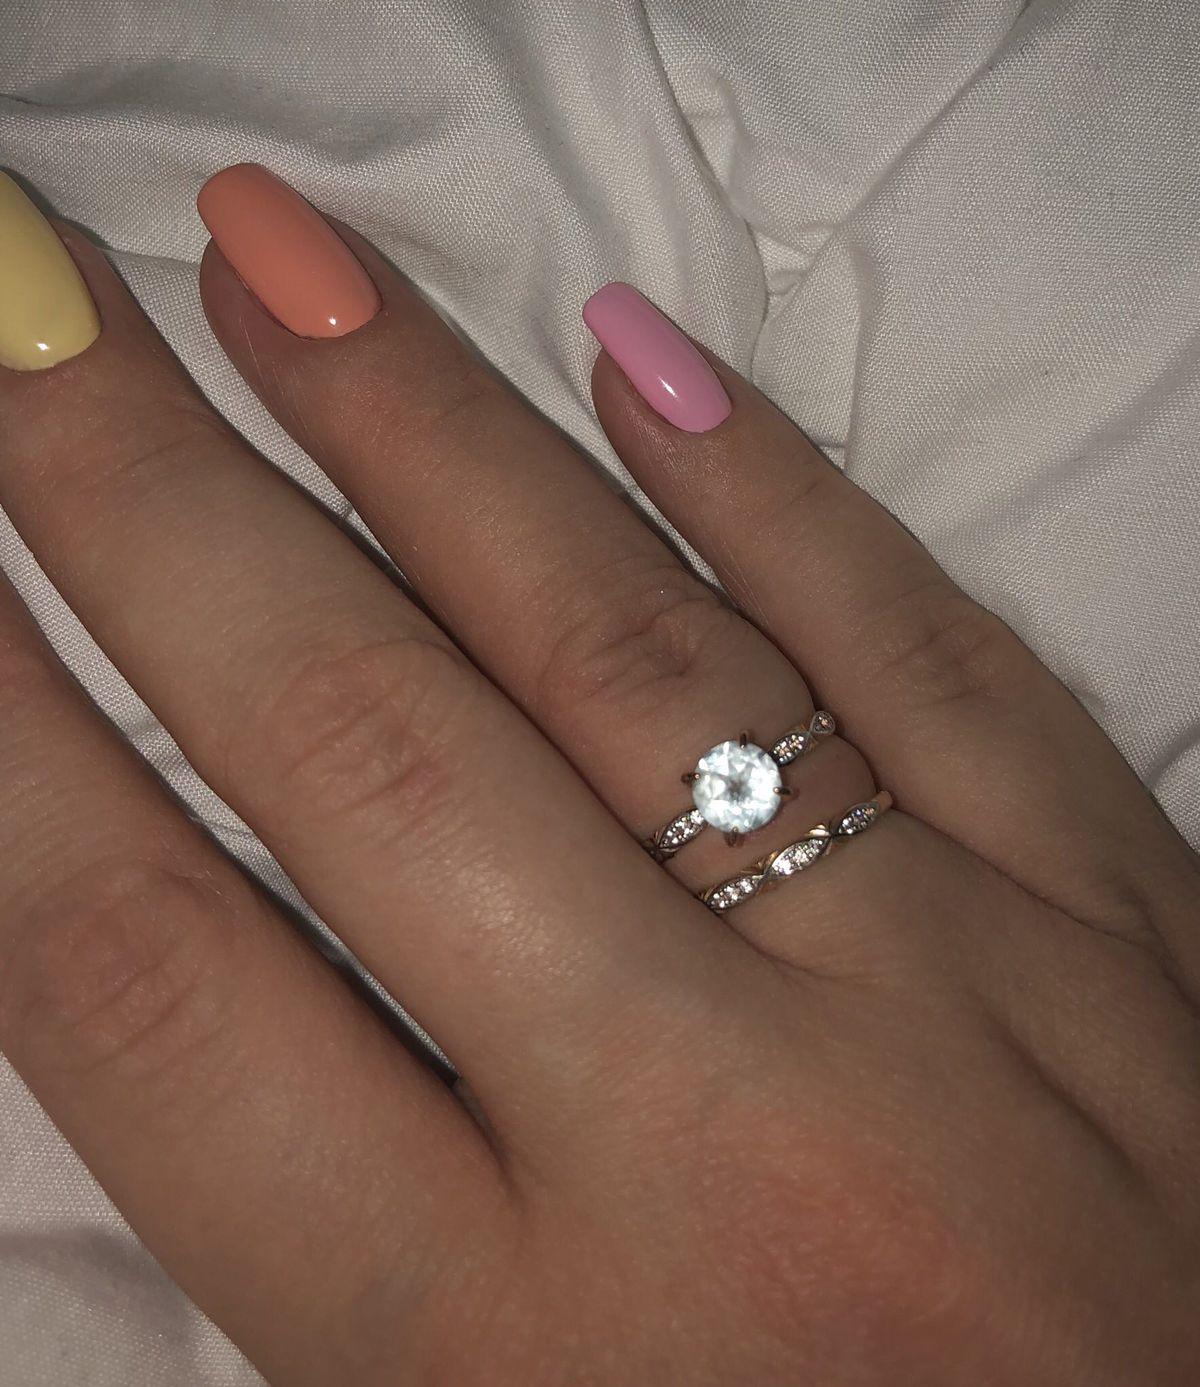 Безумно красивое кольцо)